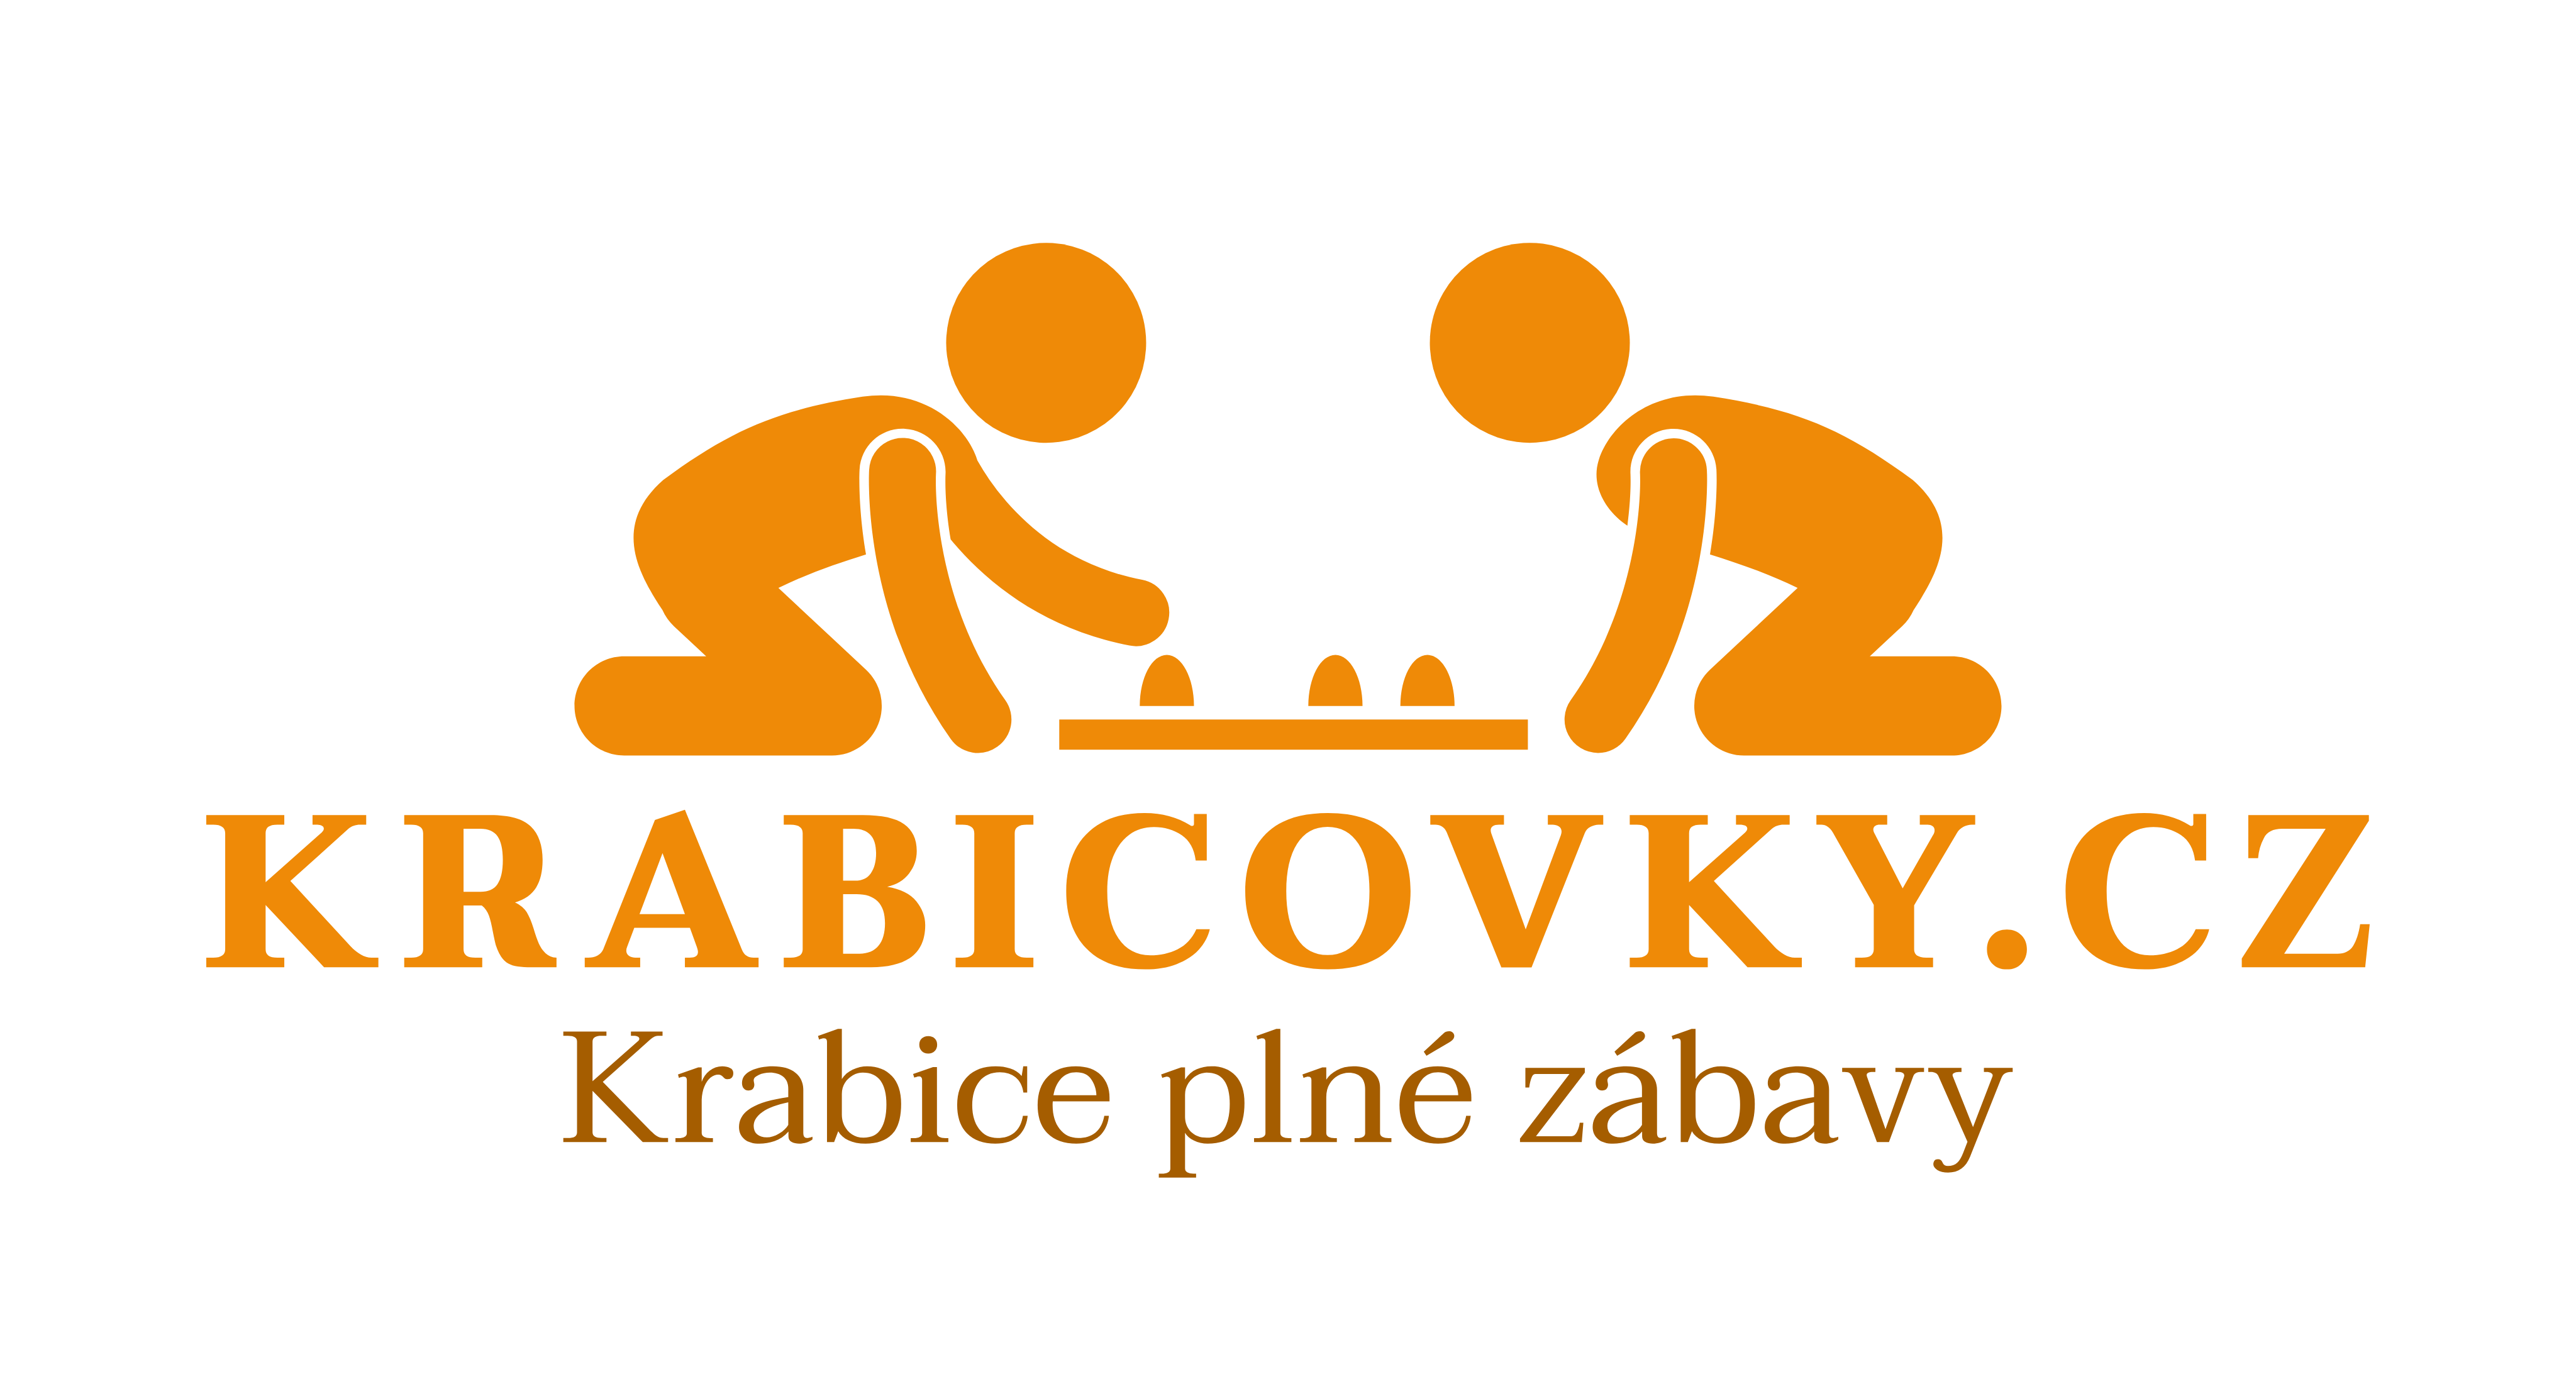 Krabicovky.cz